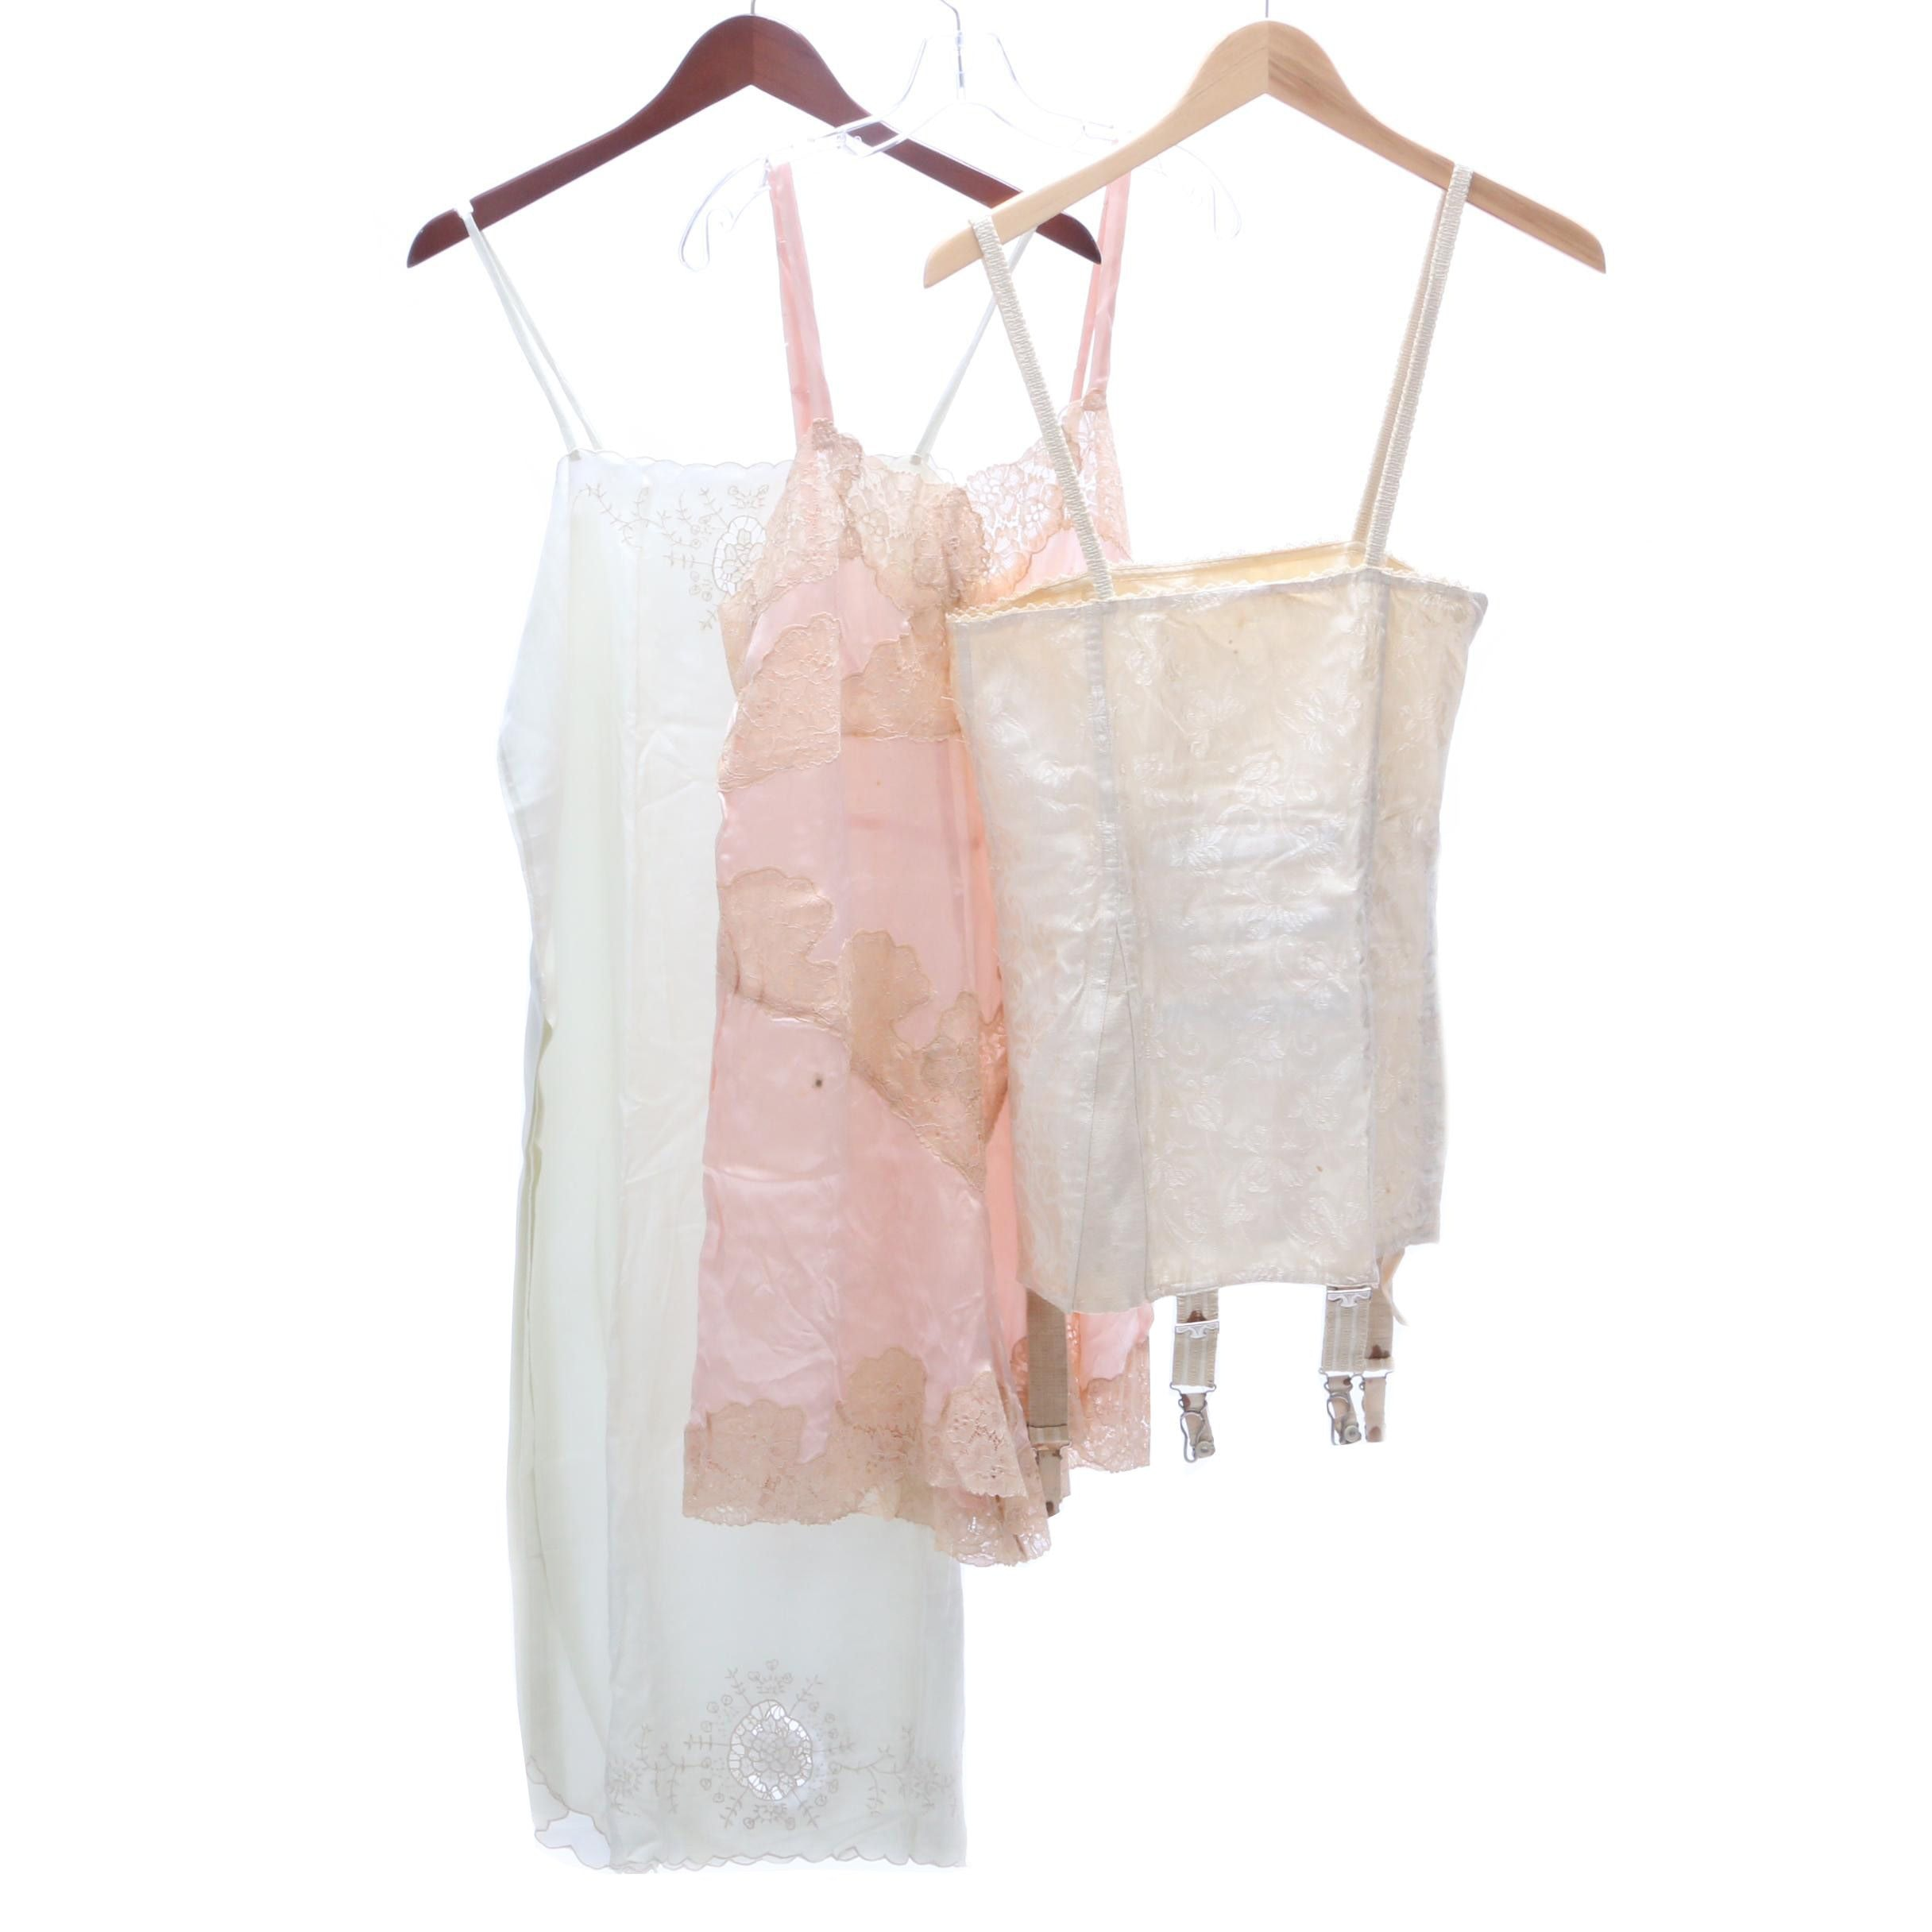 Circa 1920s Vintage Undergarments and Sleepwear